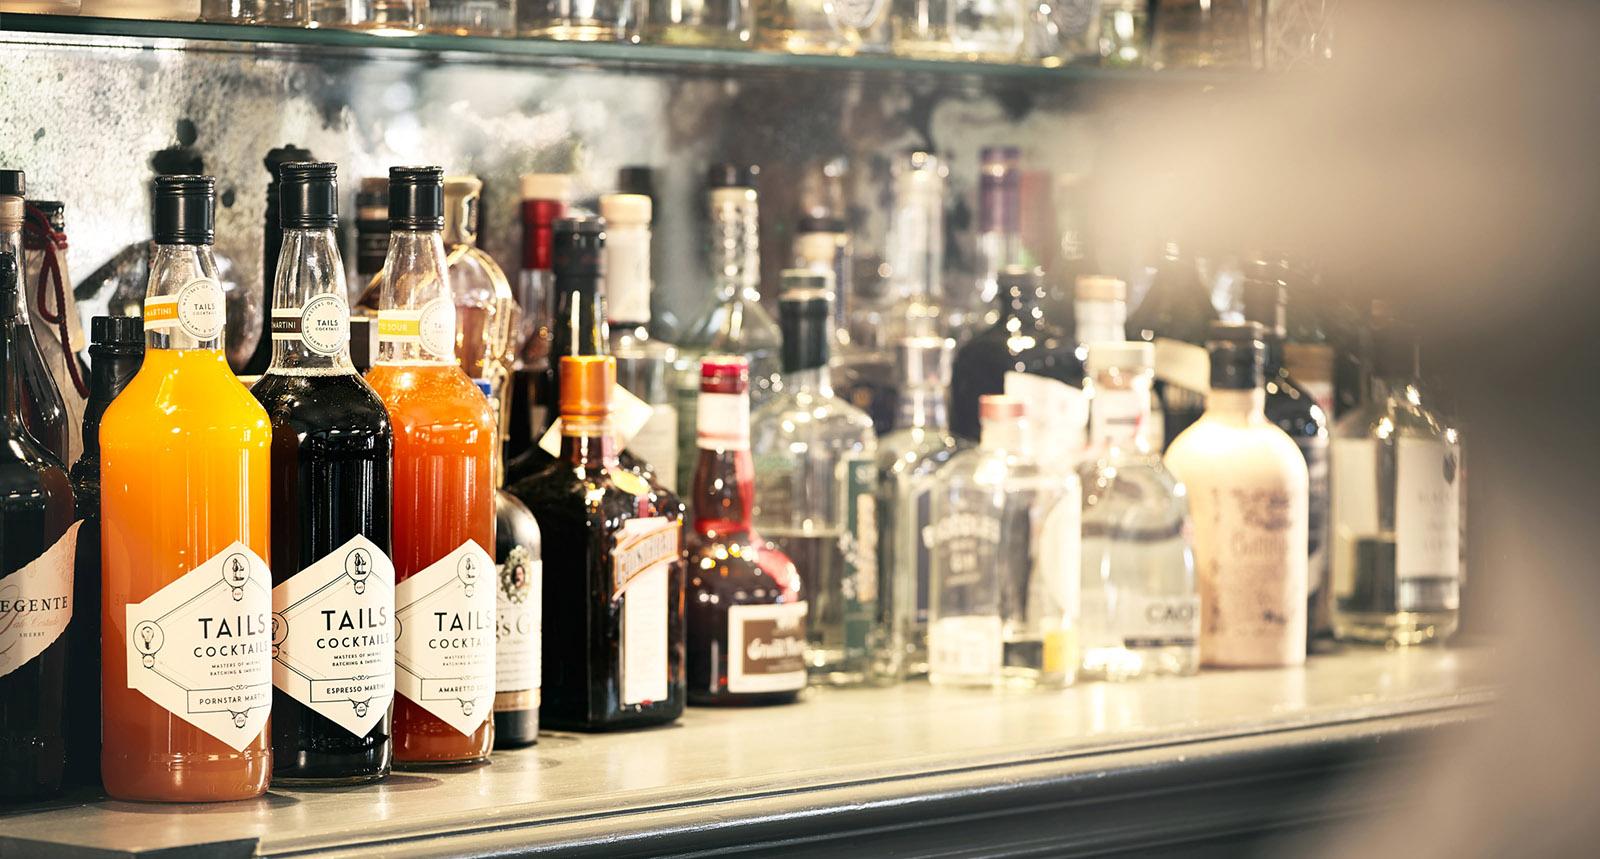 Tails Cocktails Drinks